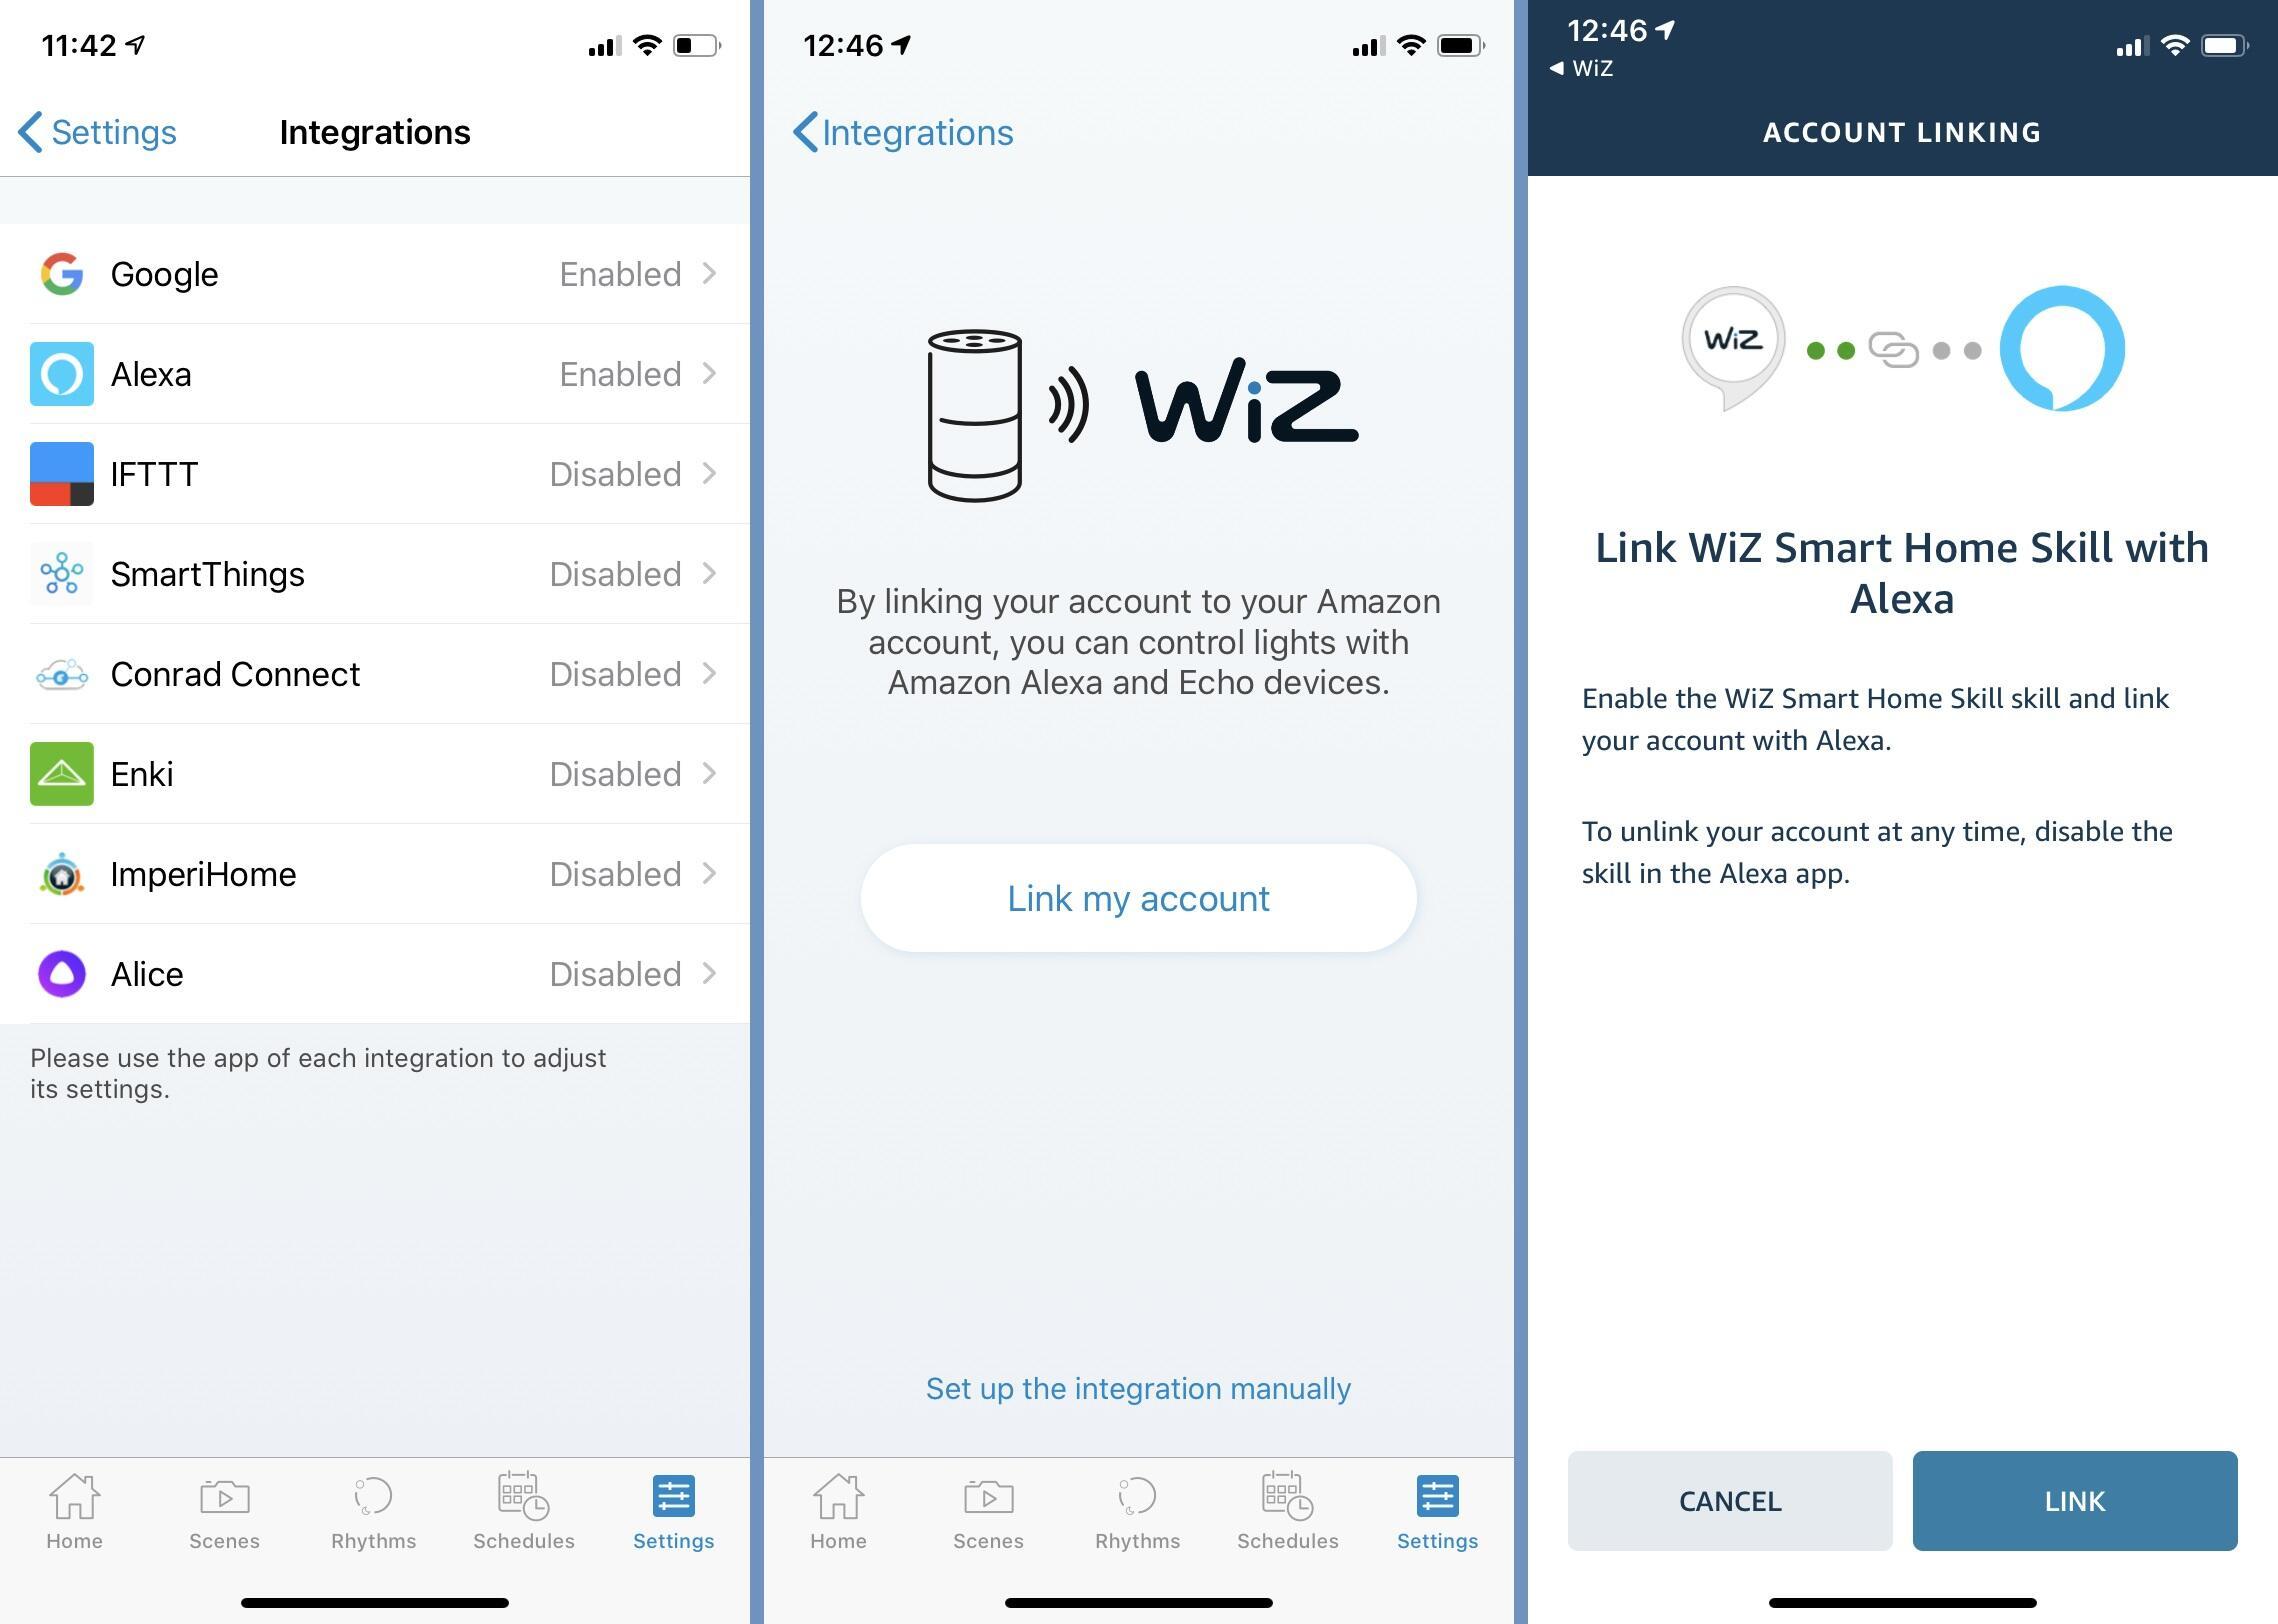 philips-wiz-connected-smart-wi-fi-led-light-bulb-ios-app-amazon-alexa-integration